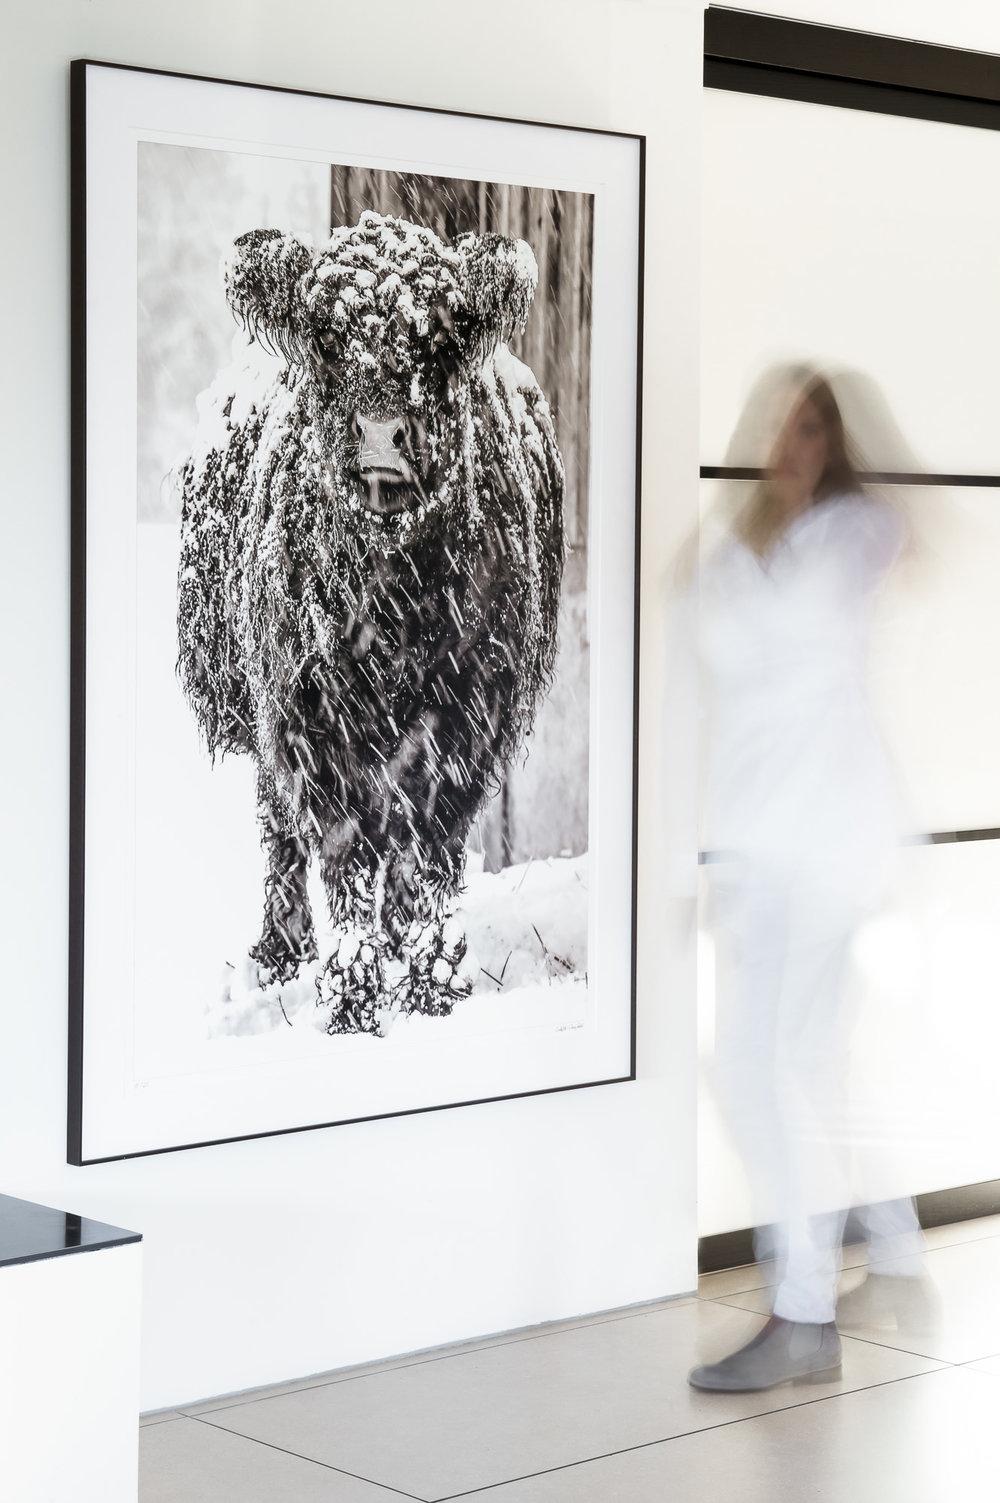 Carolina 1 17/25,fine art print 100cm x 150cm Rahmen Wenge 122cm x 174cm